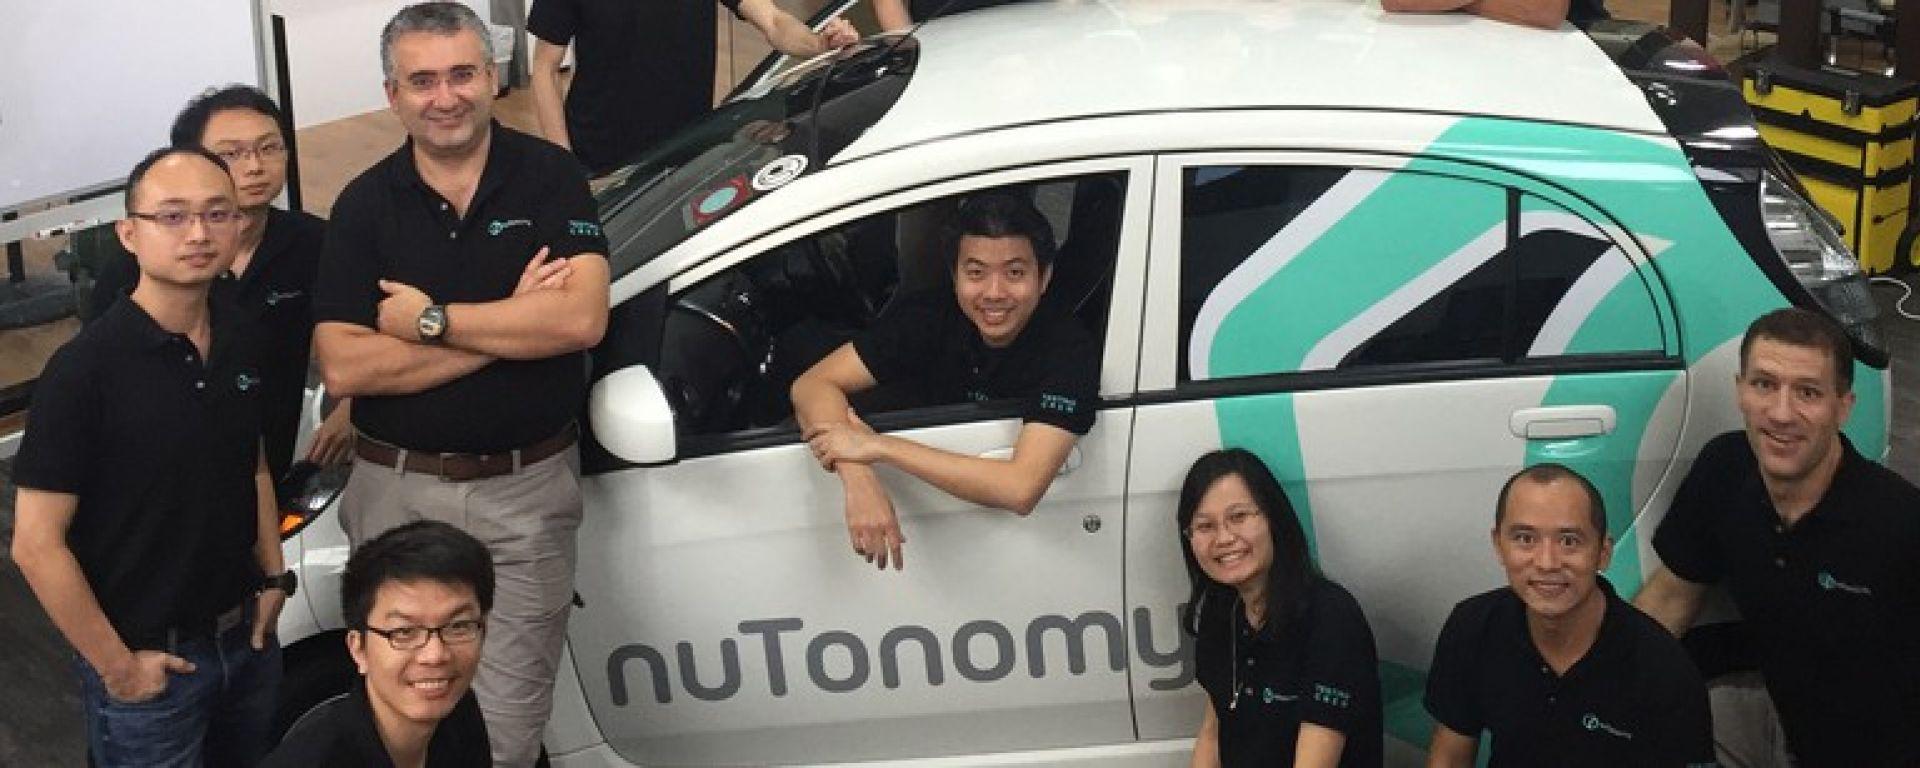 nuTonomy sfida Google, Tesla e Uber nella corsa ai taxi robot